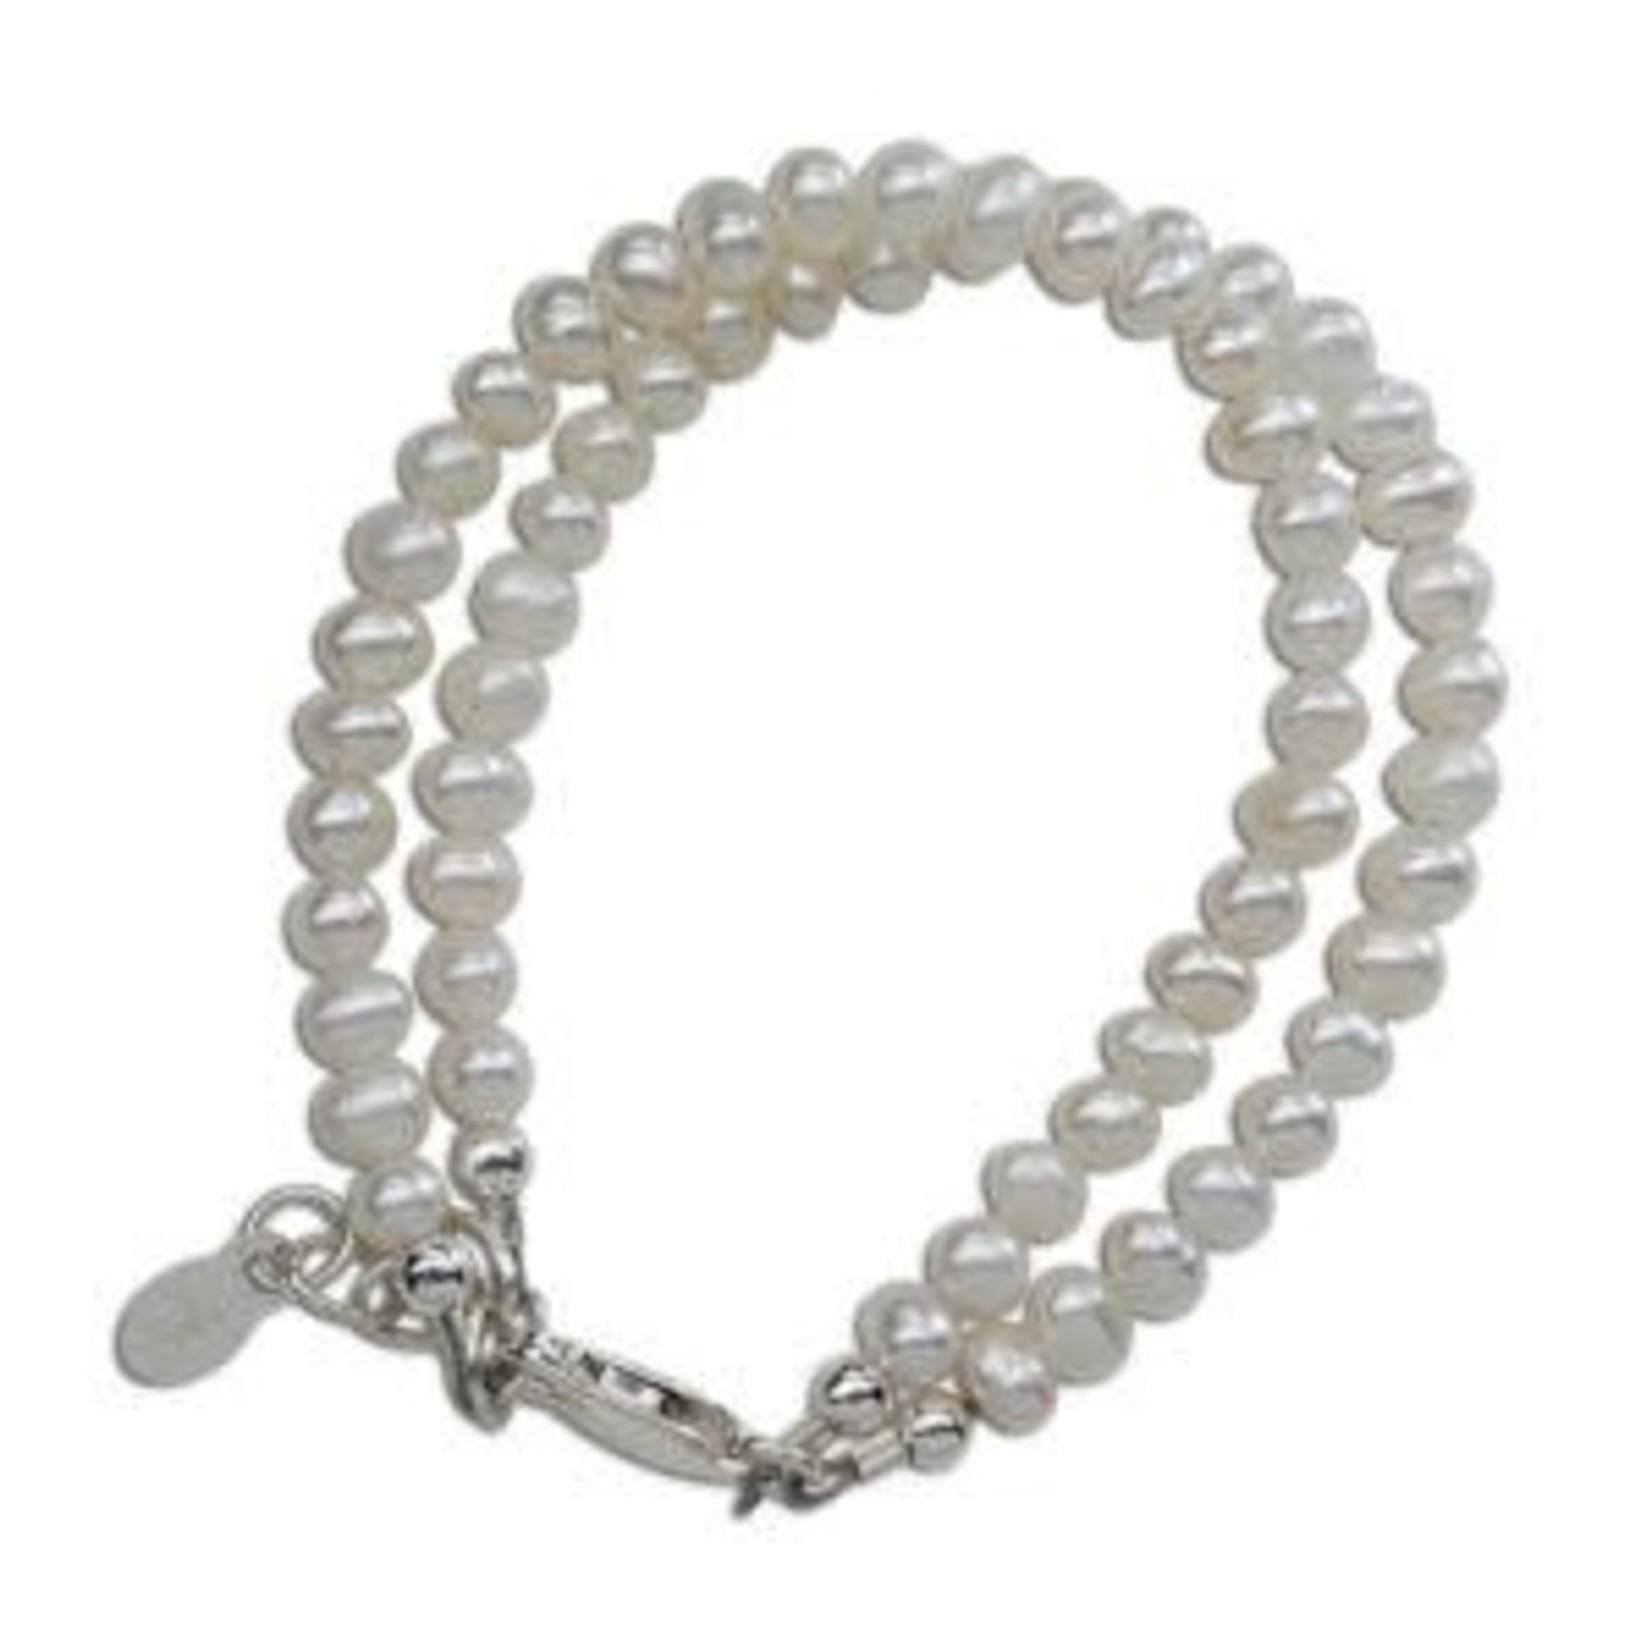 Cherished Moments Elizabeth - (M) Double White Freshwater Pearls